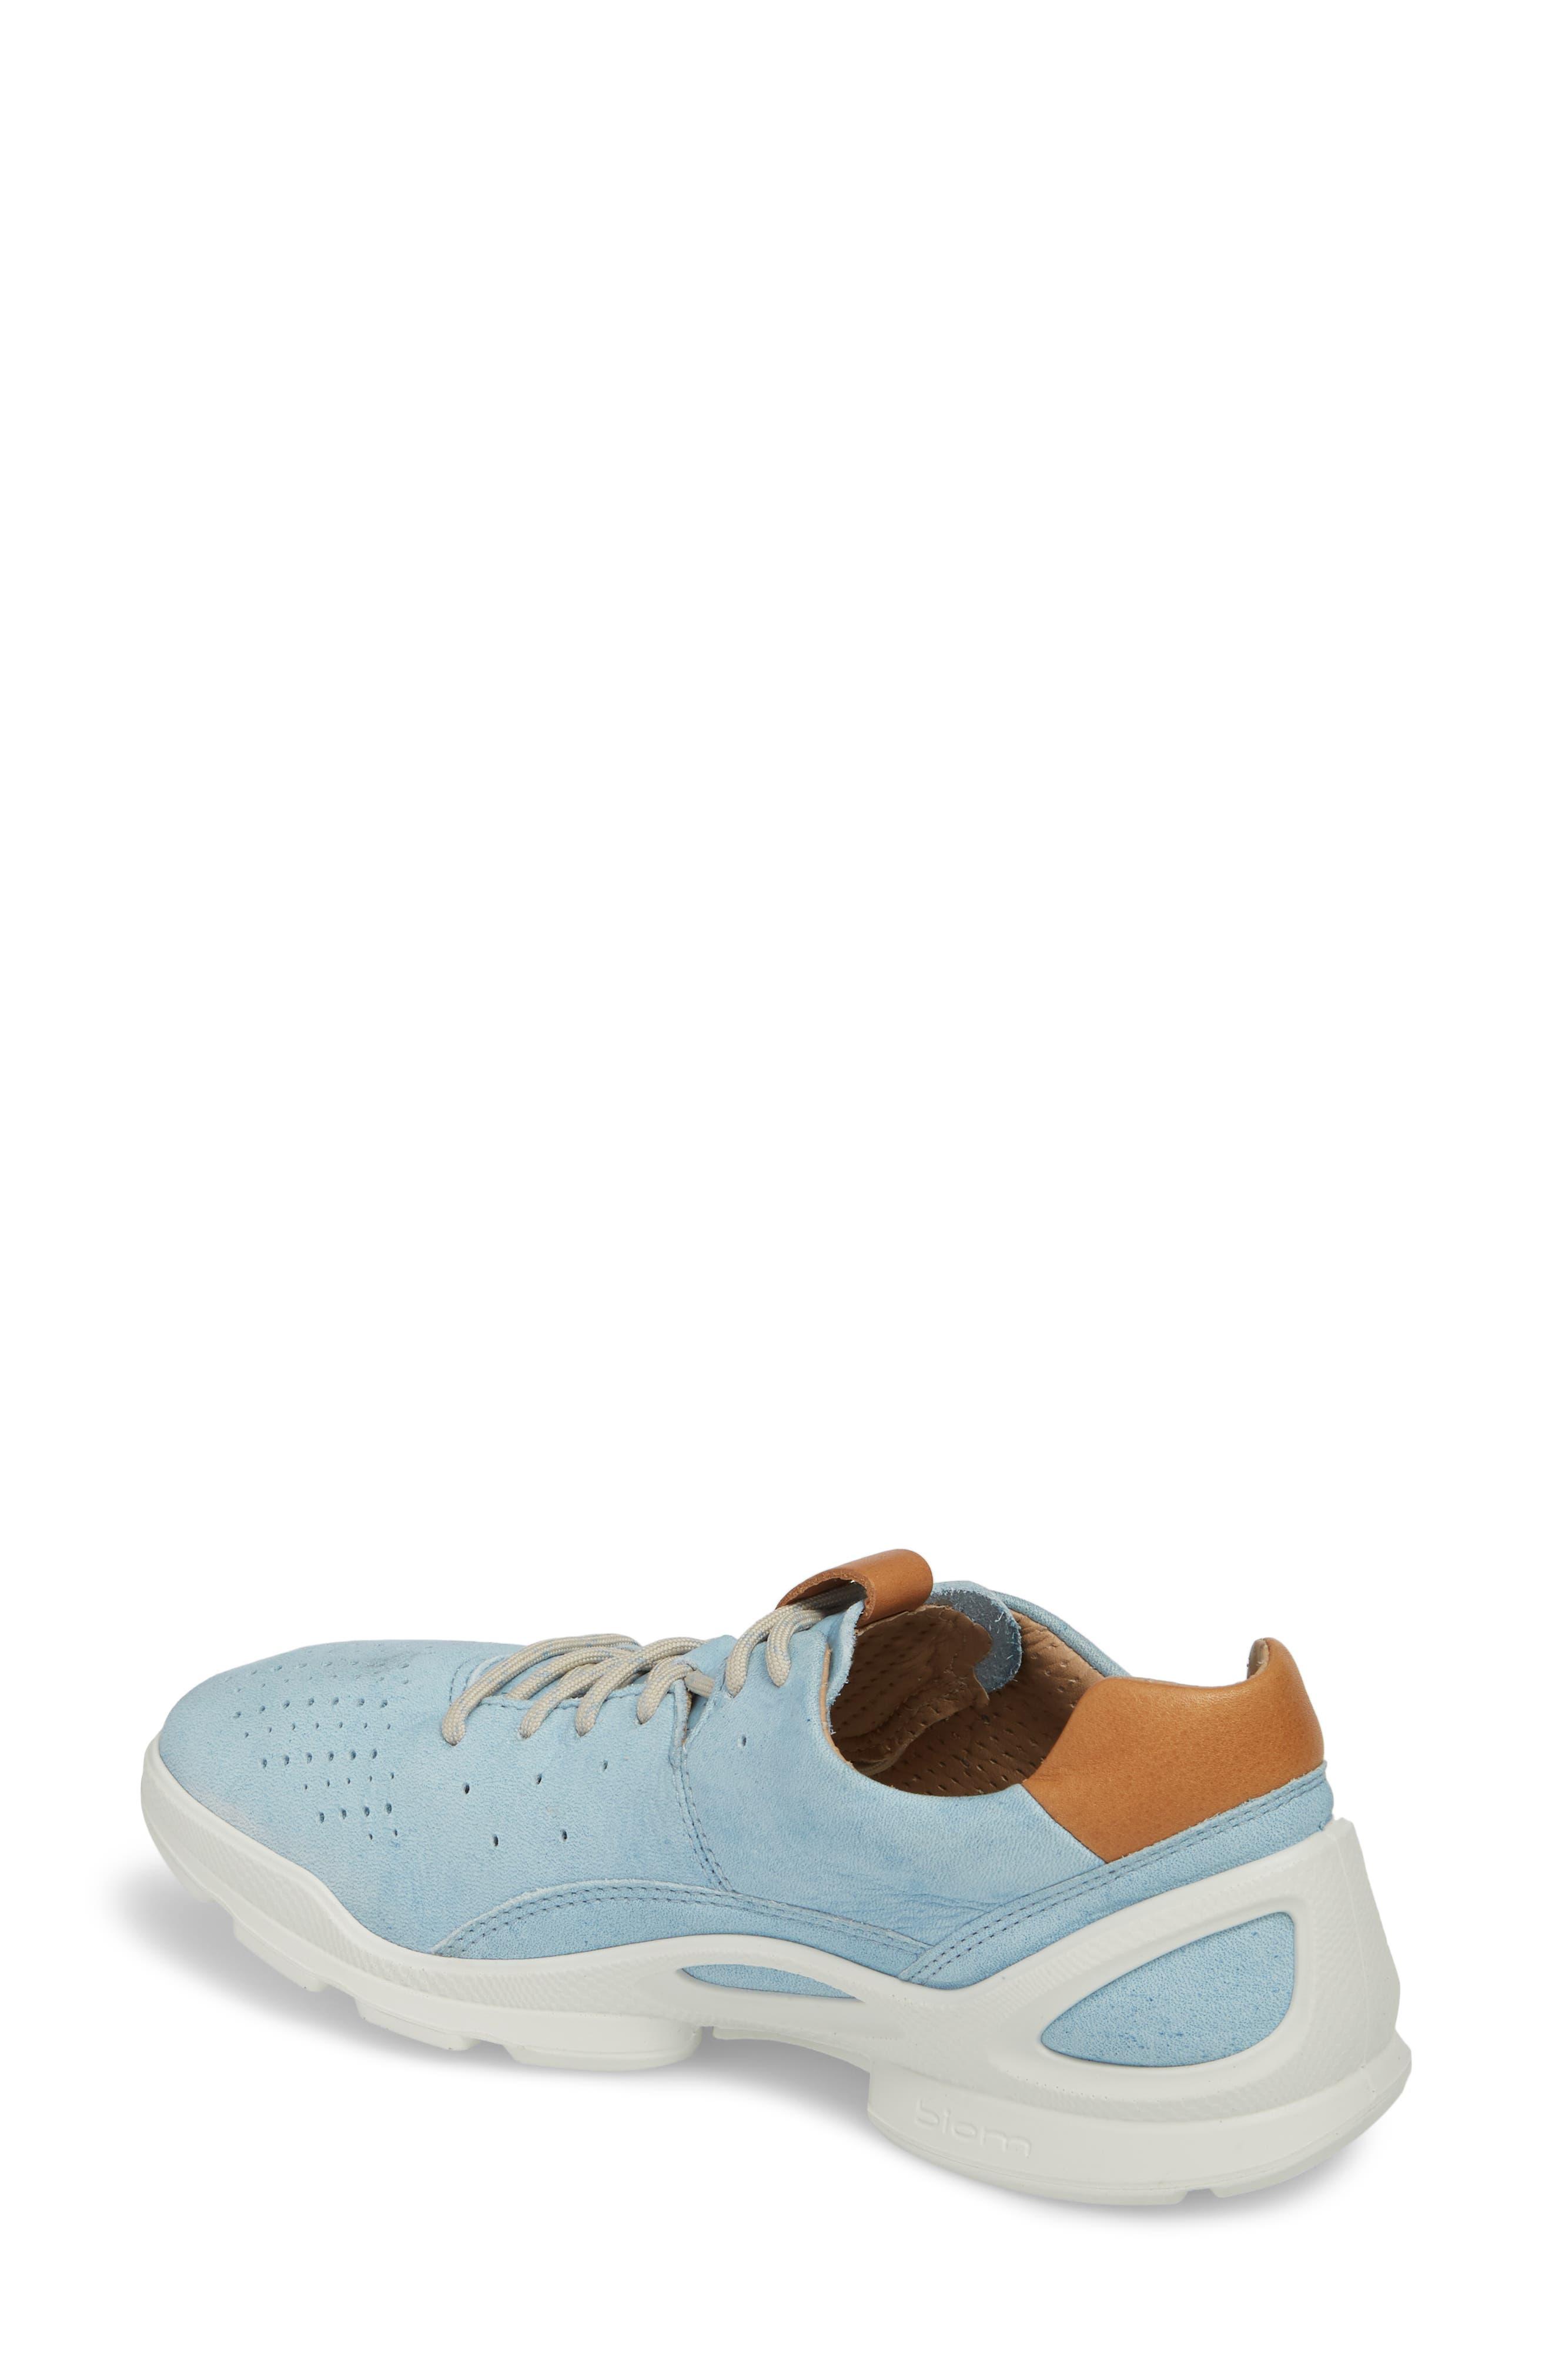 Biom Street Sneaker,                             Alternate thumbnail 4, color,